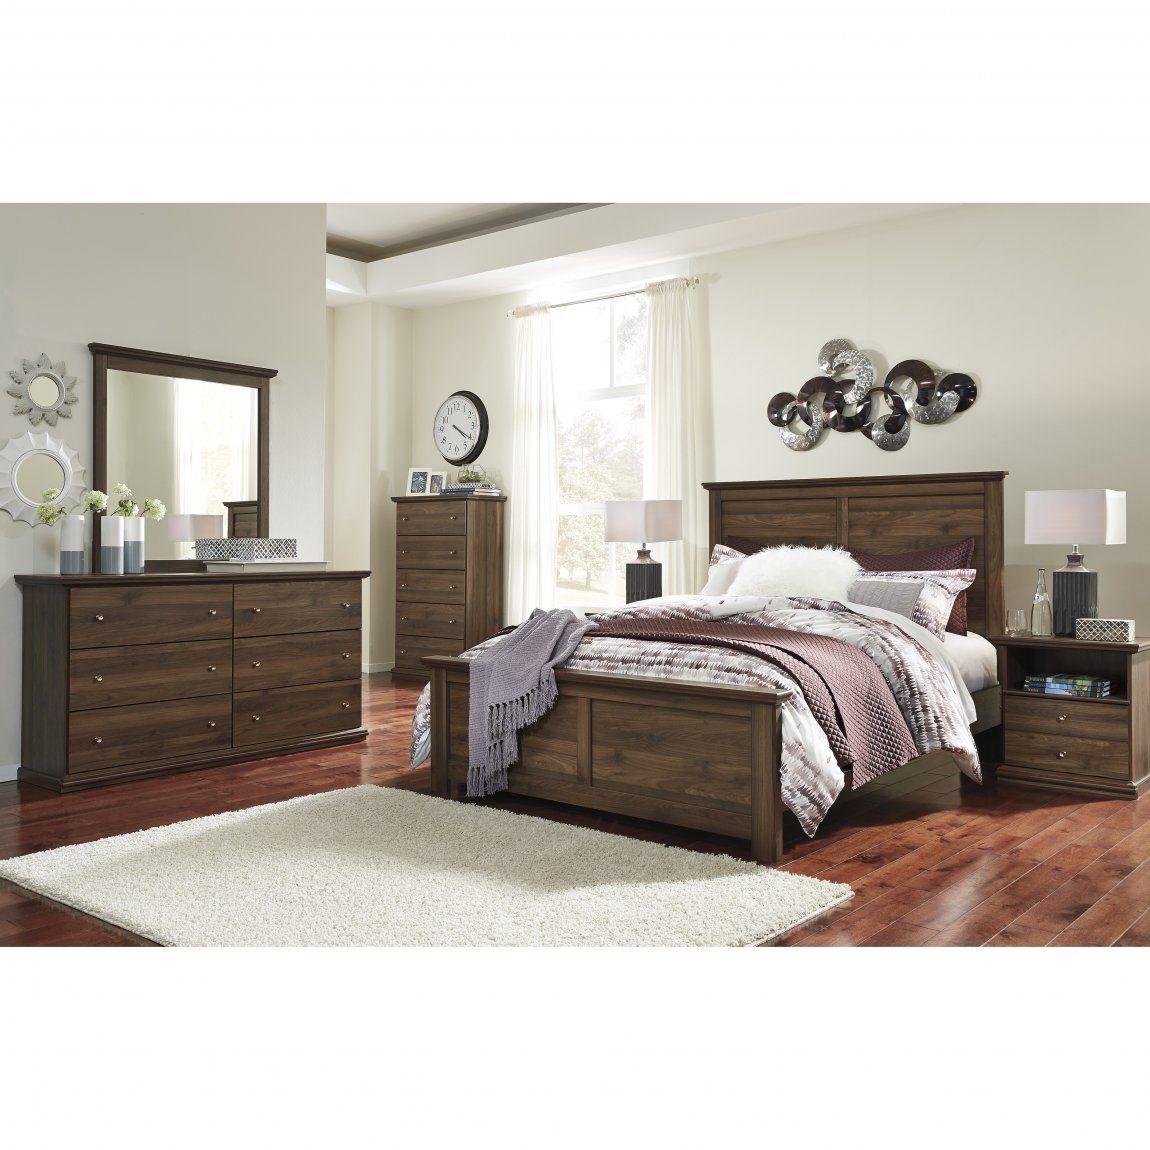 Cheap Nice Bedroom Sets Reclaimed Wood Bedroom Set White